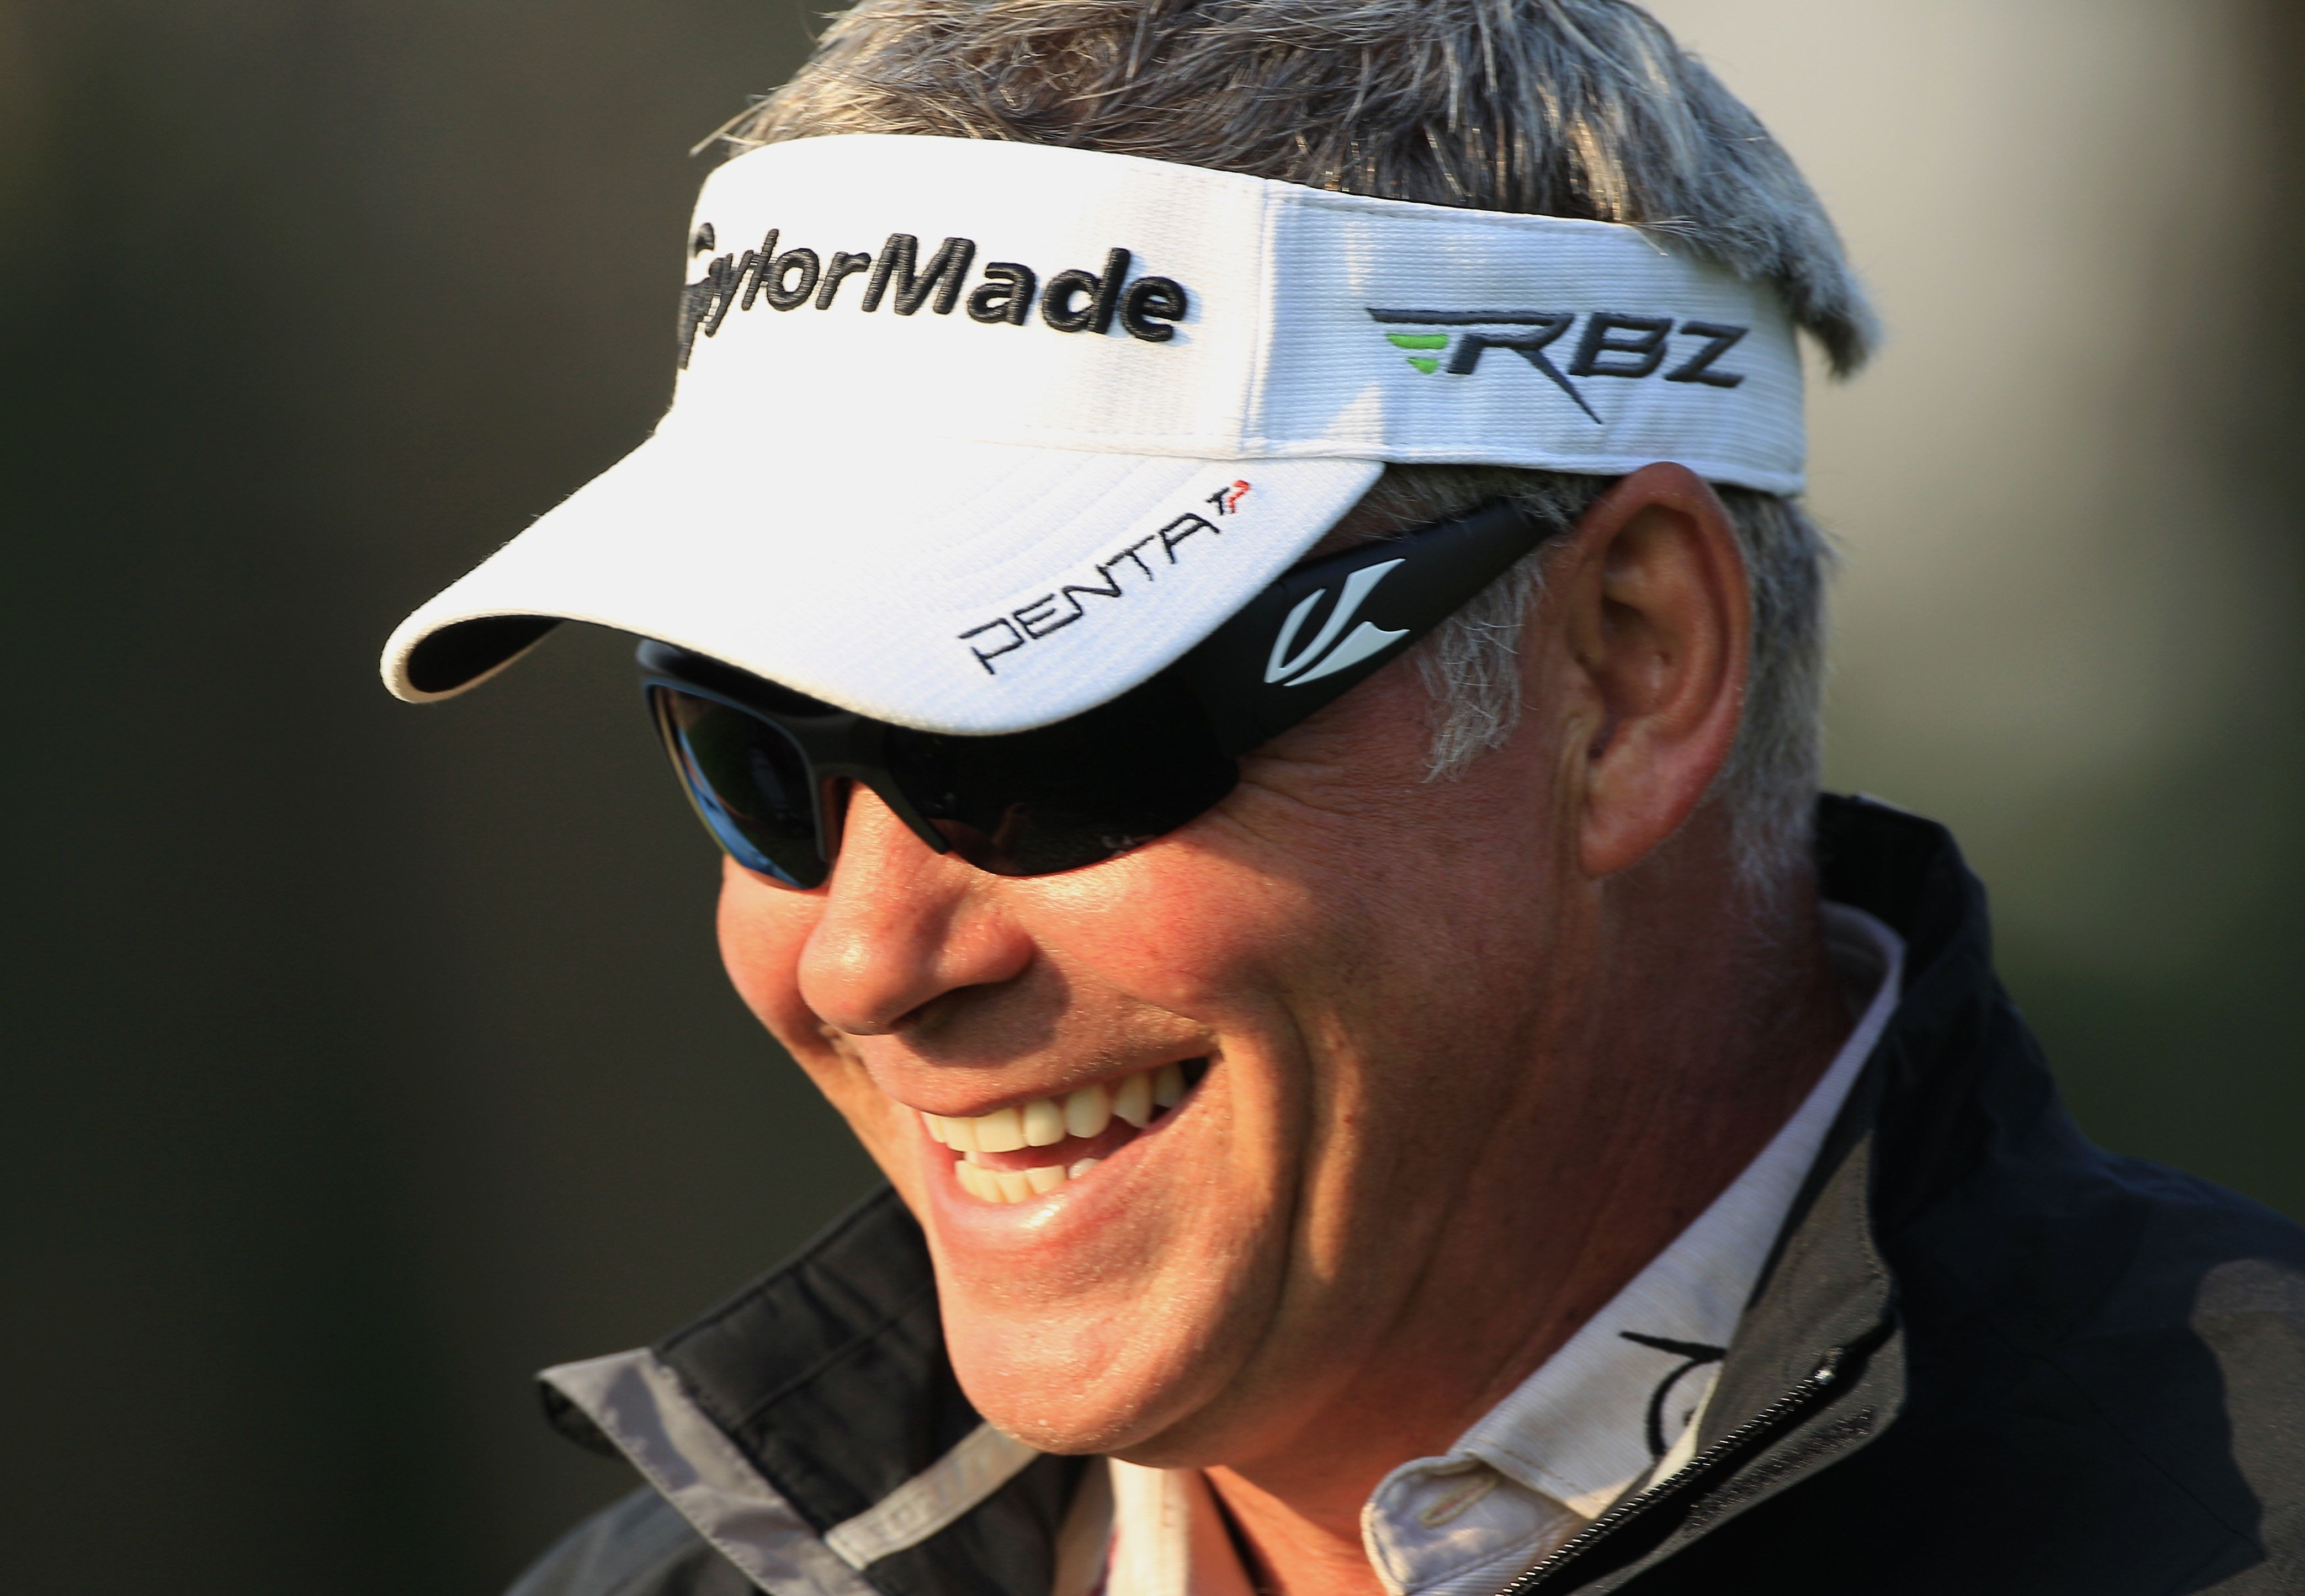 Kaenon mens sunglasses - Darren Clarke Wears Kaenon Hard Kore Sunglasses While Playing Golf On The Pga Tour